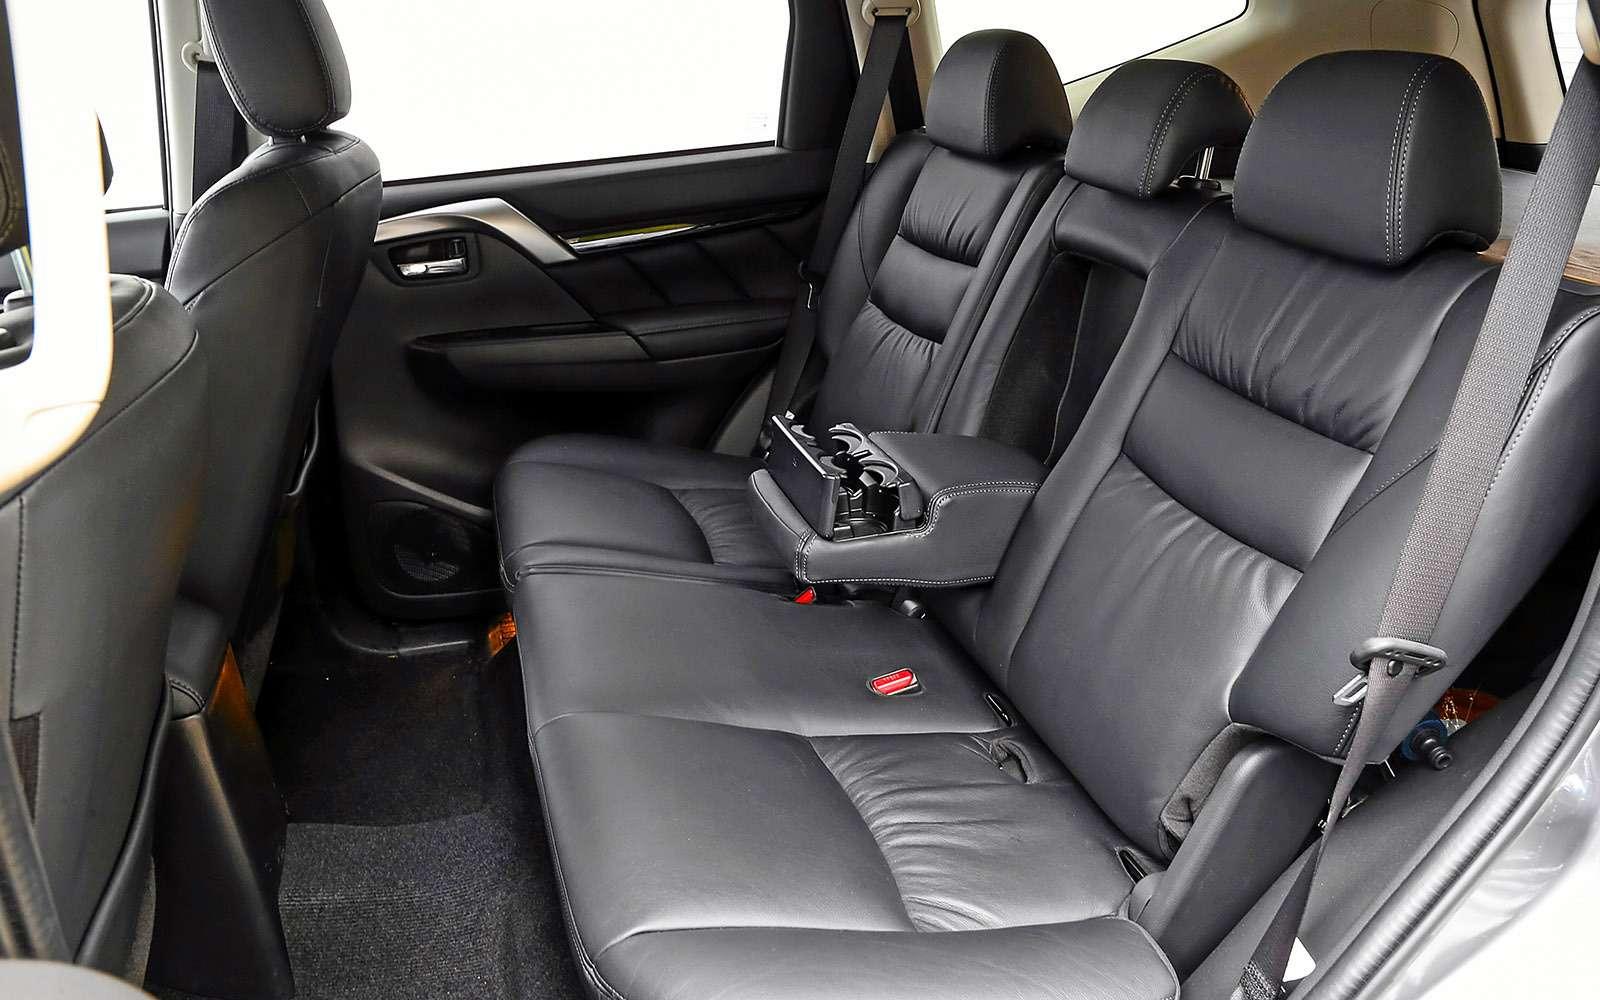 Mitsubishi Pajero Sport иKia Mohave— сравнительный тест настоящих внедорожников— фото 769875